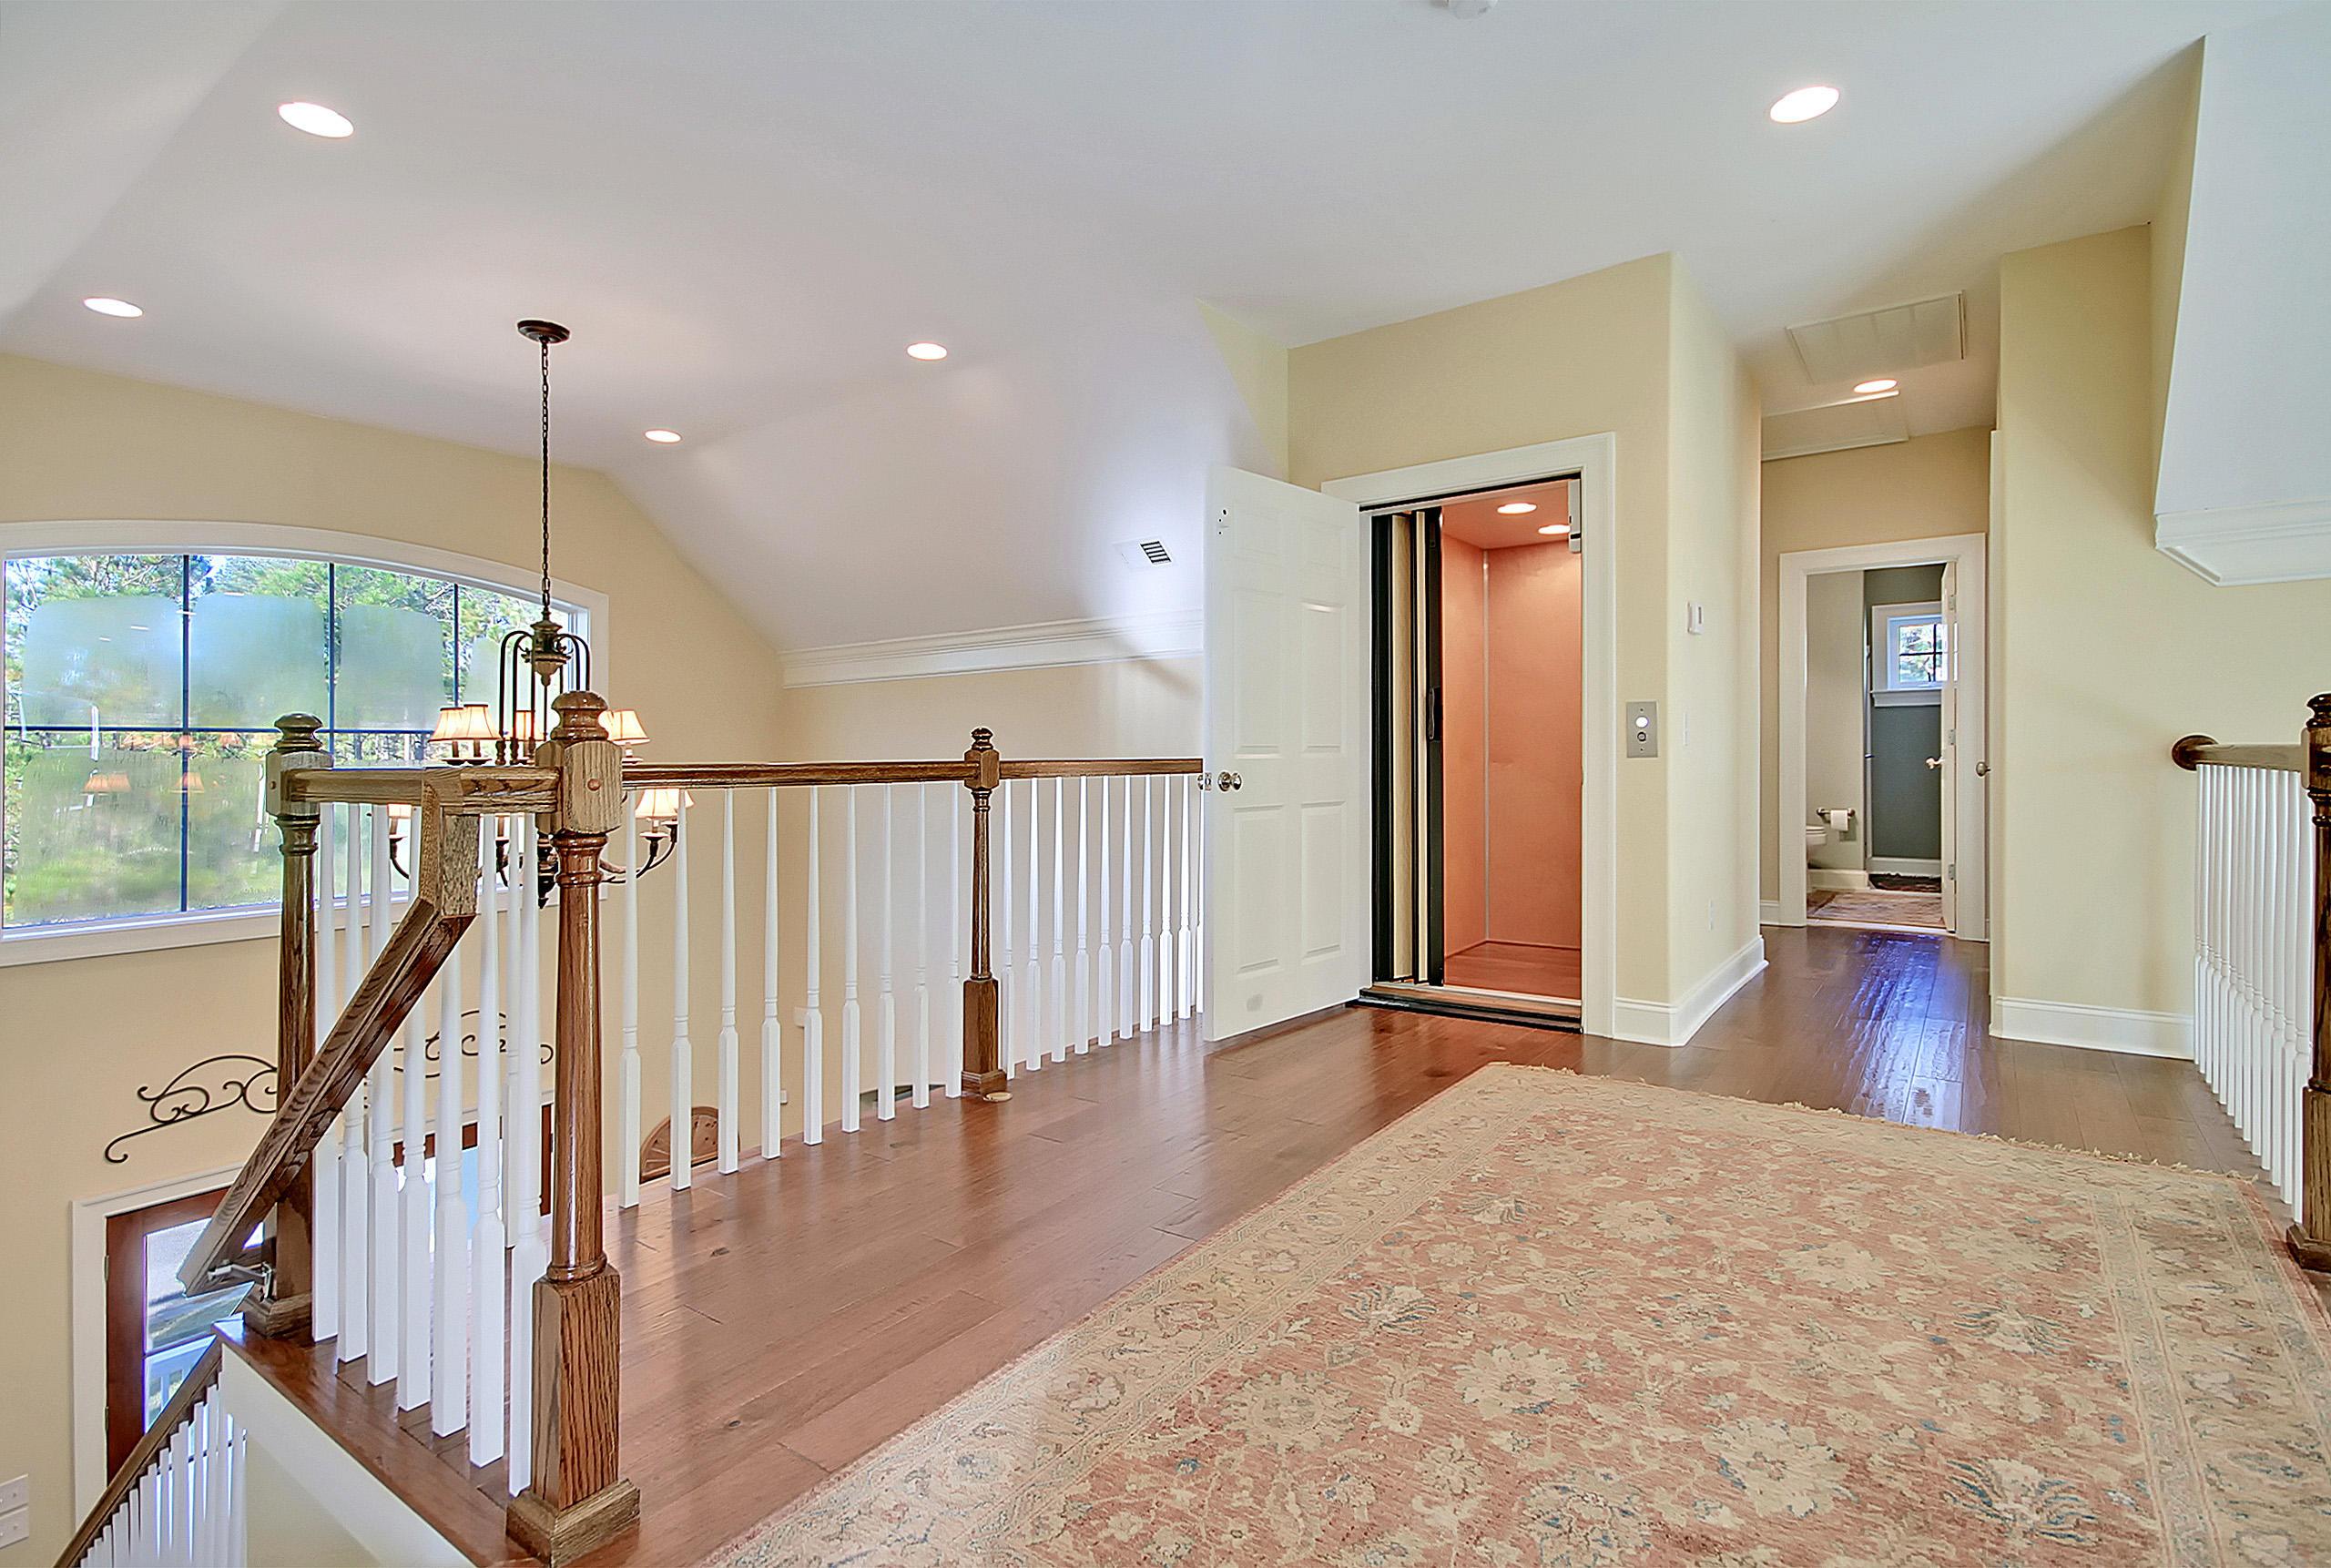 Rivertowne Country Club Homes For Sale - 2601 Kiln Creek, Mount Pleasant, SC - 47